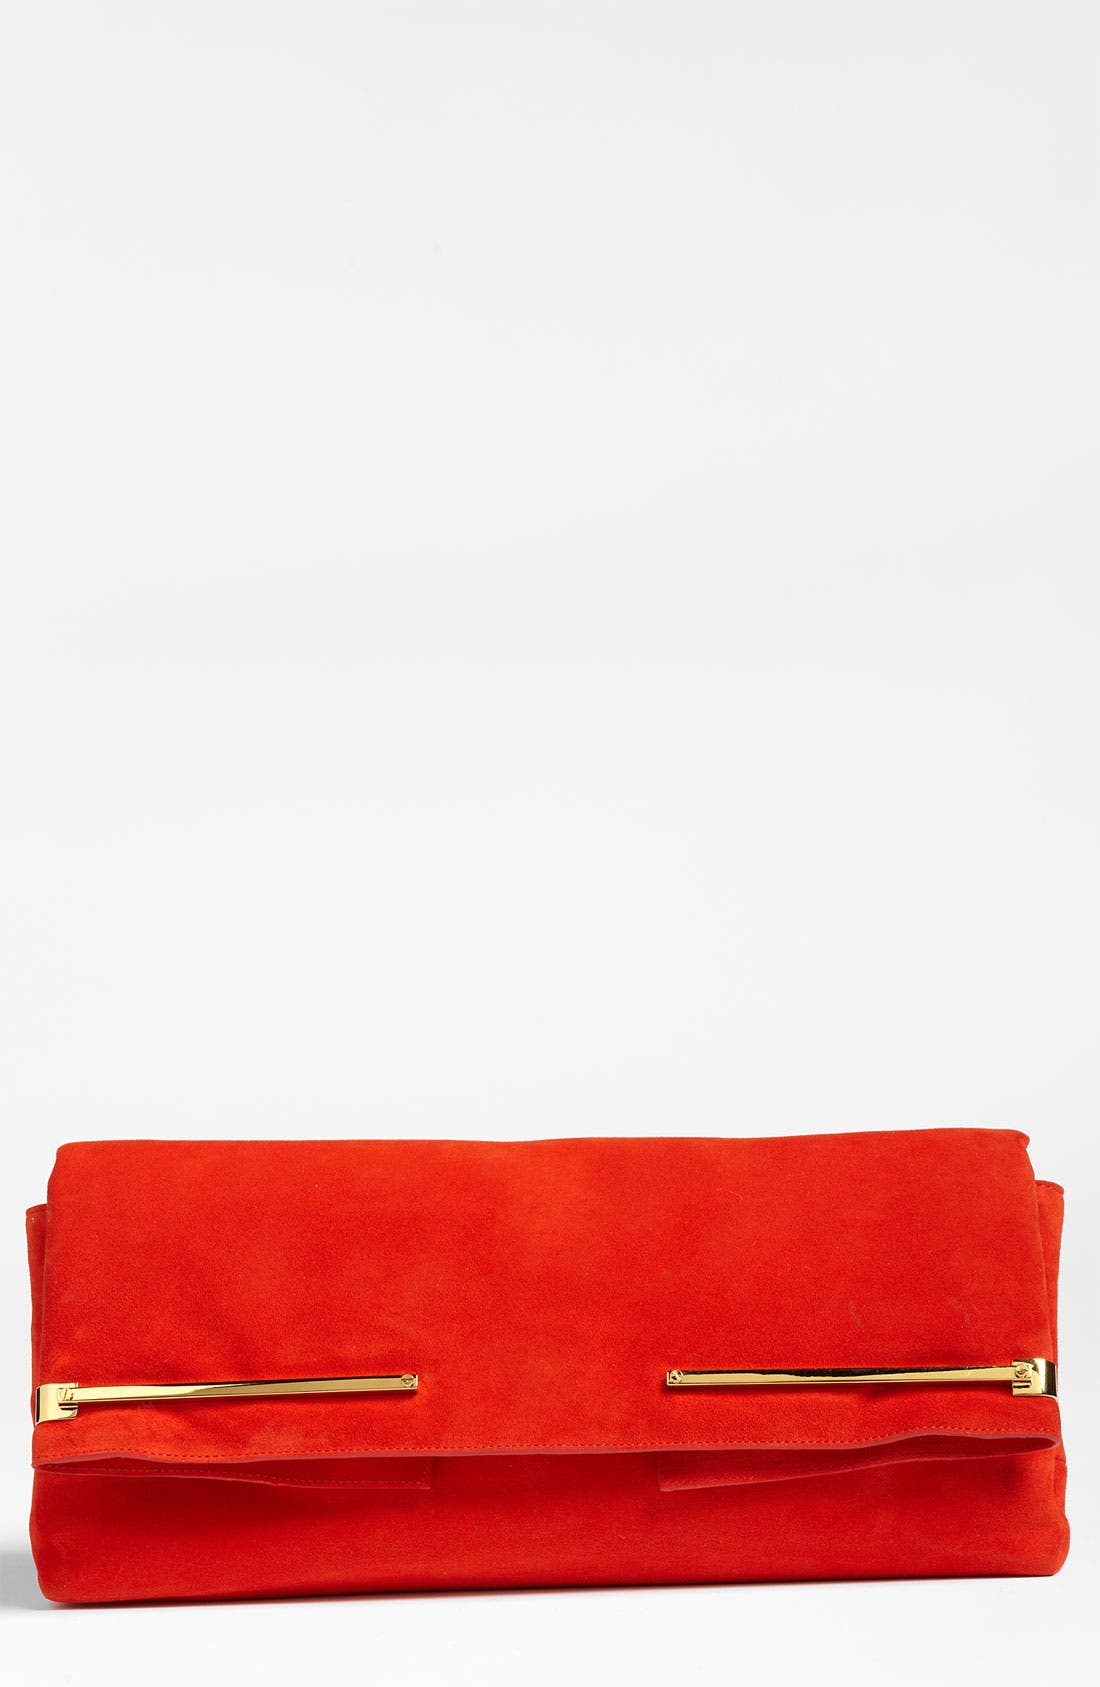 Main Image - Lanvin Leather Clutch